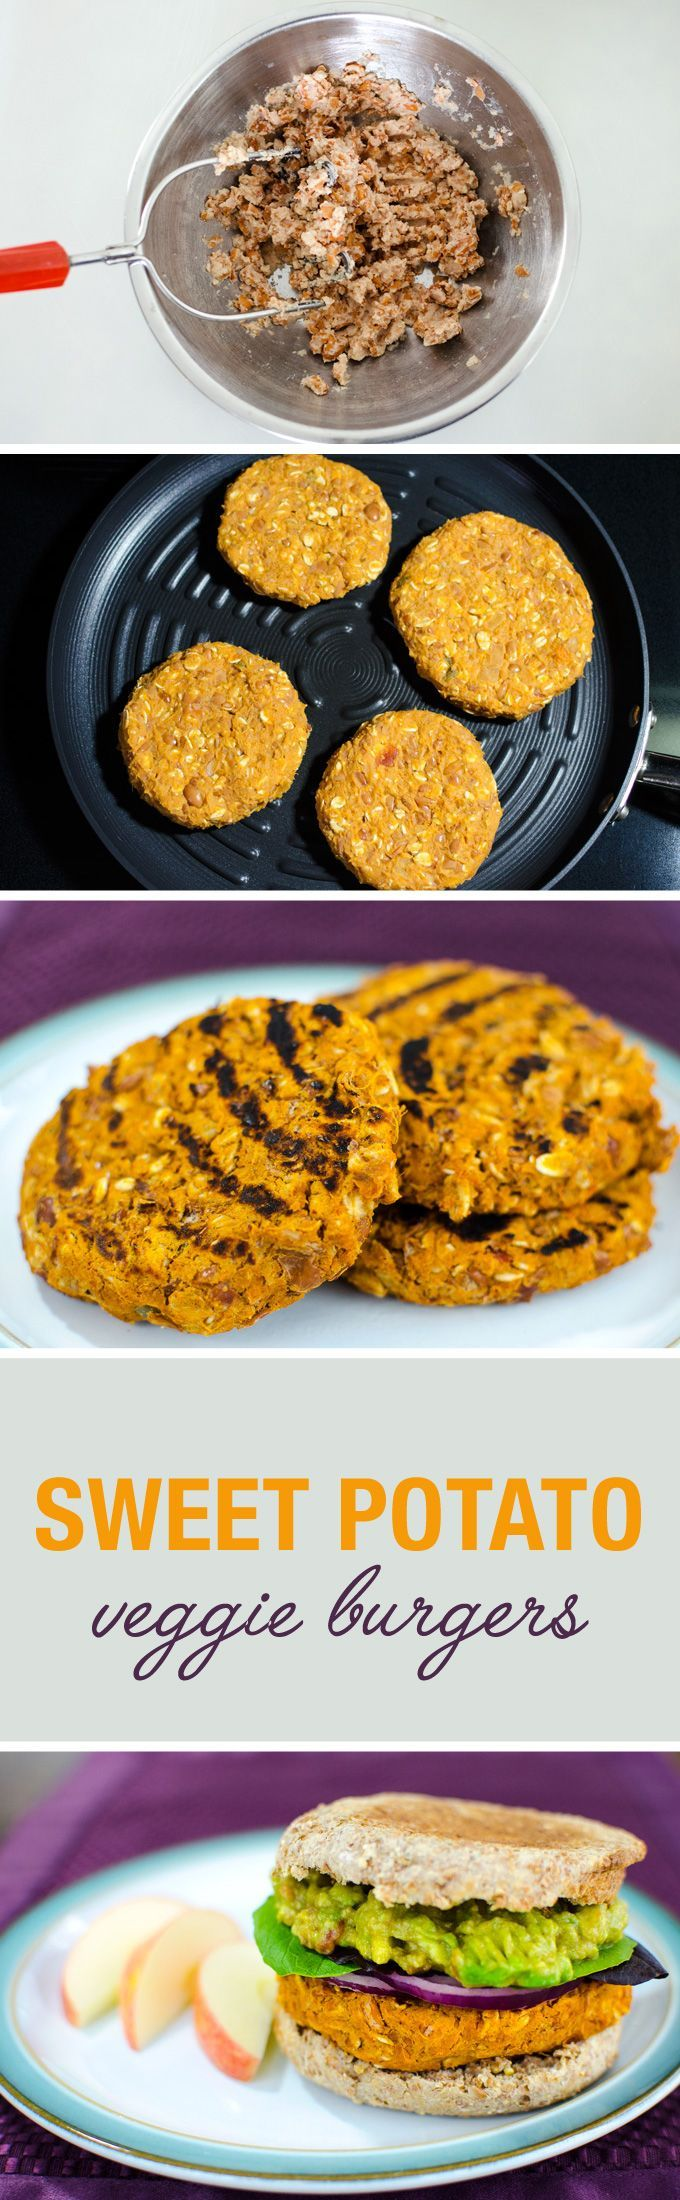 Moist and flavorful Sweet Potato Veggie Burgers #vegan #burgers